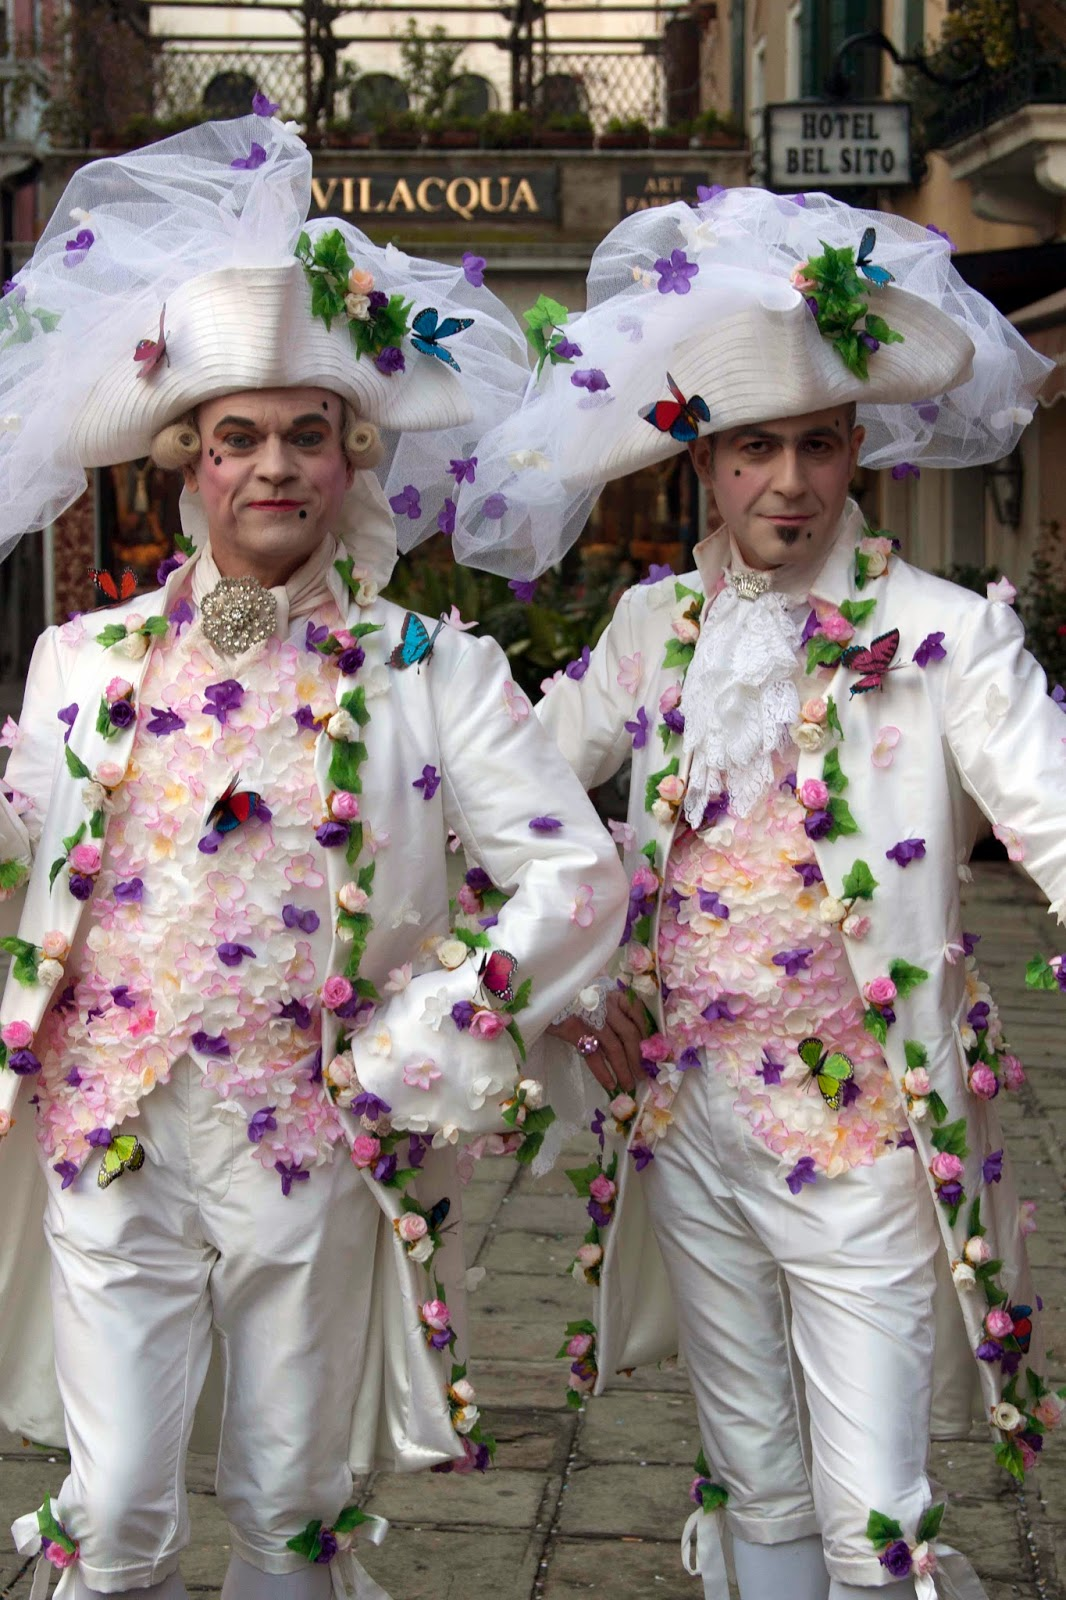 Carnival in Venice: dressed up dandies